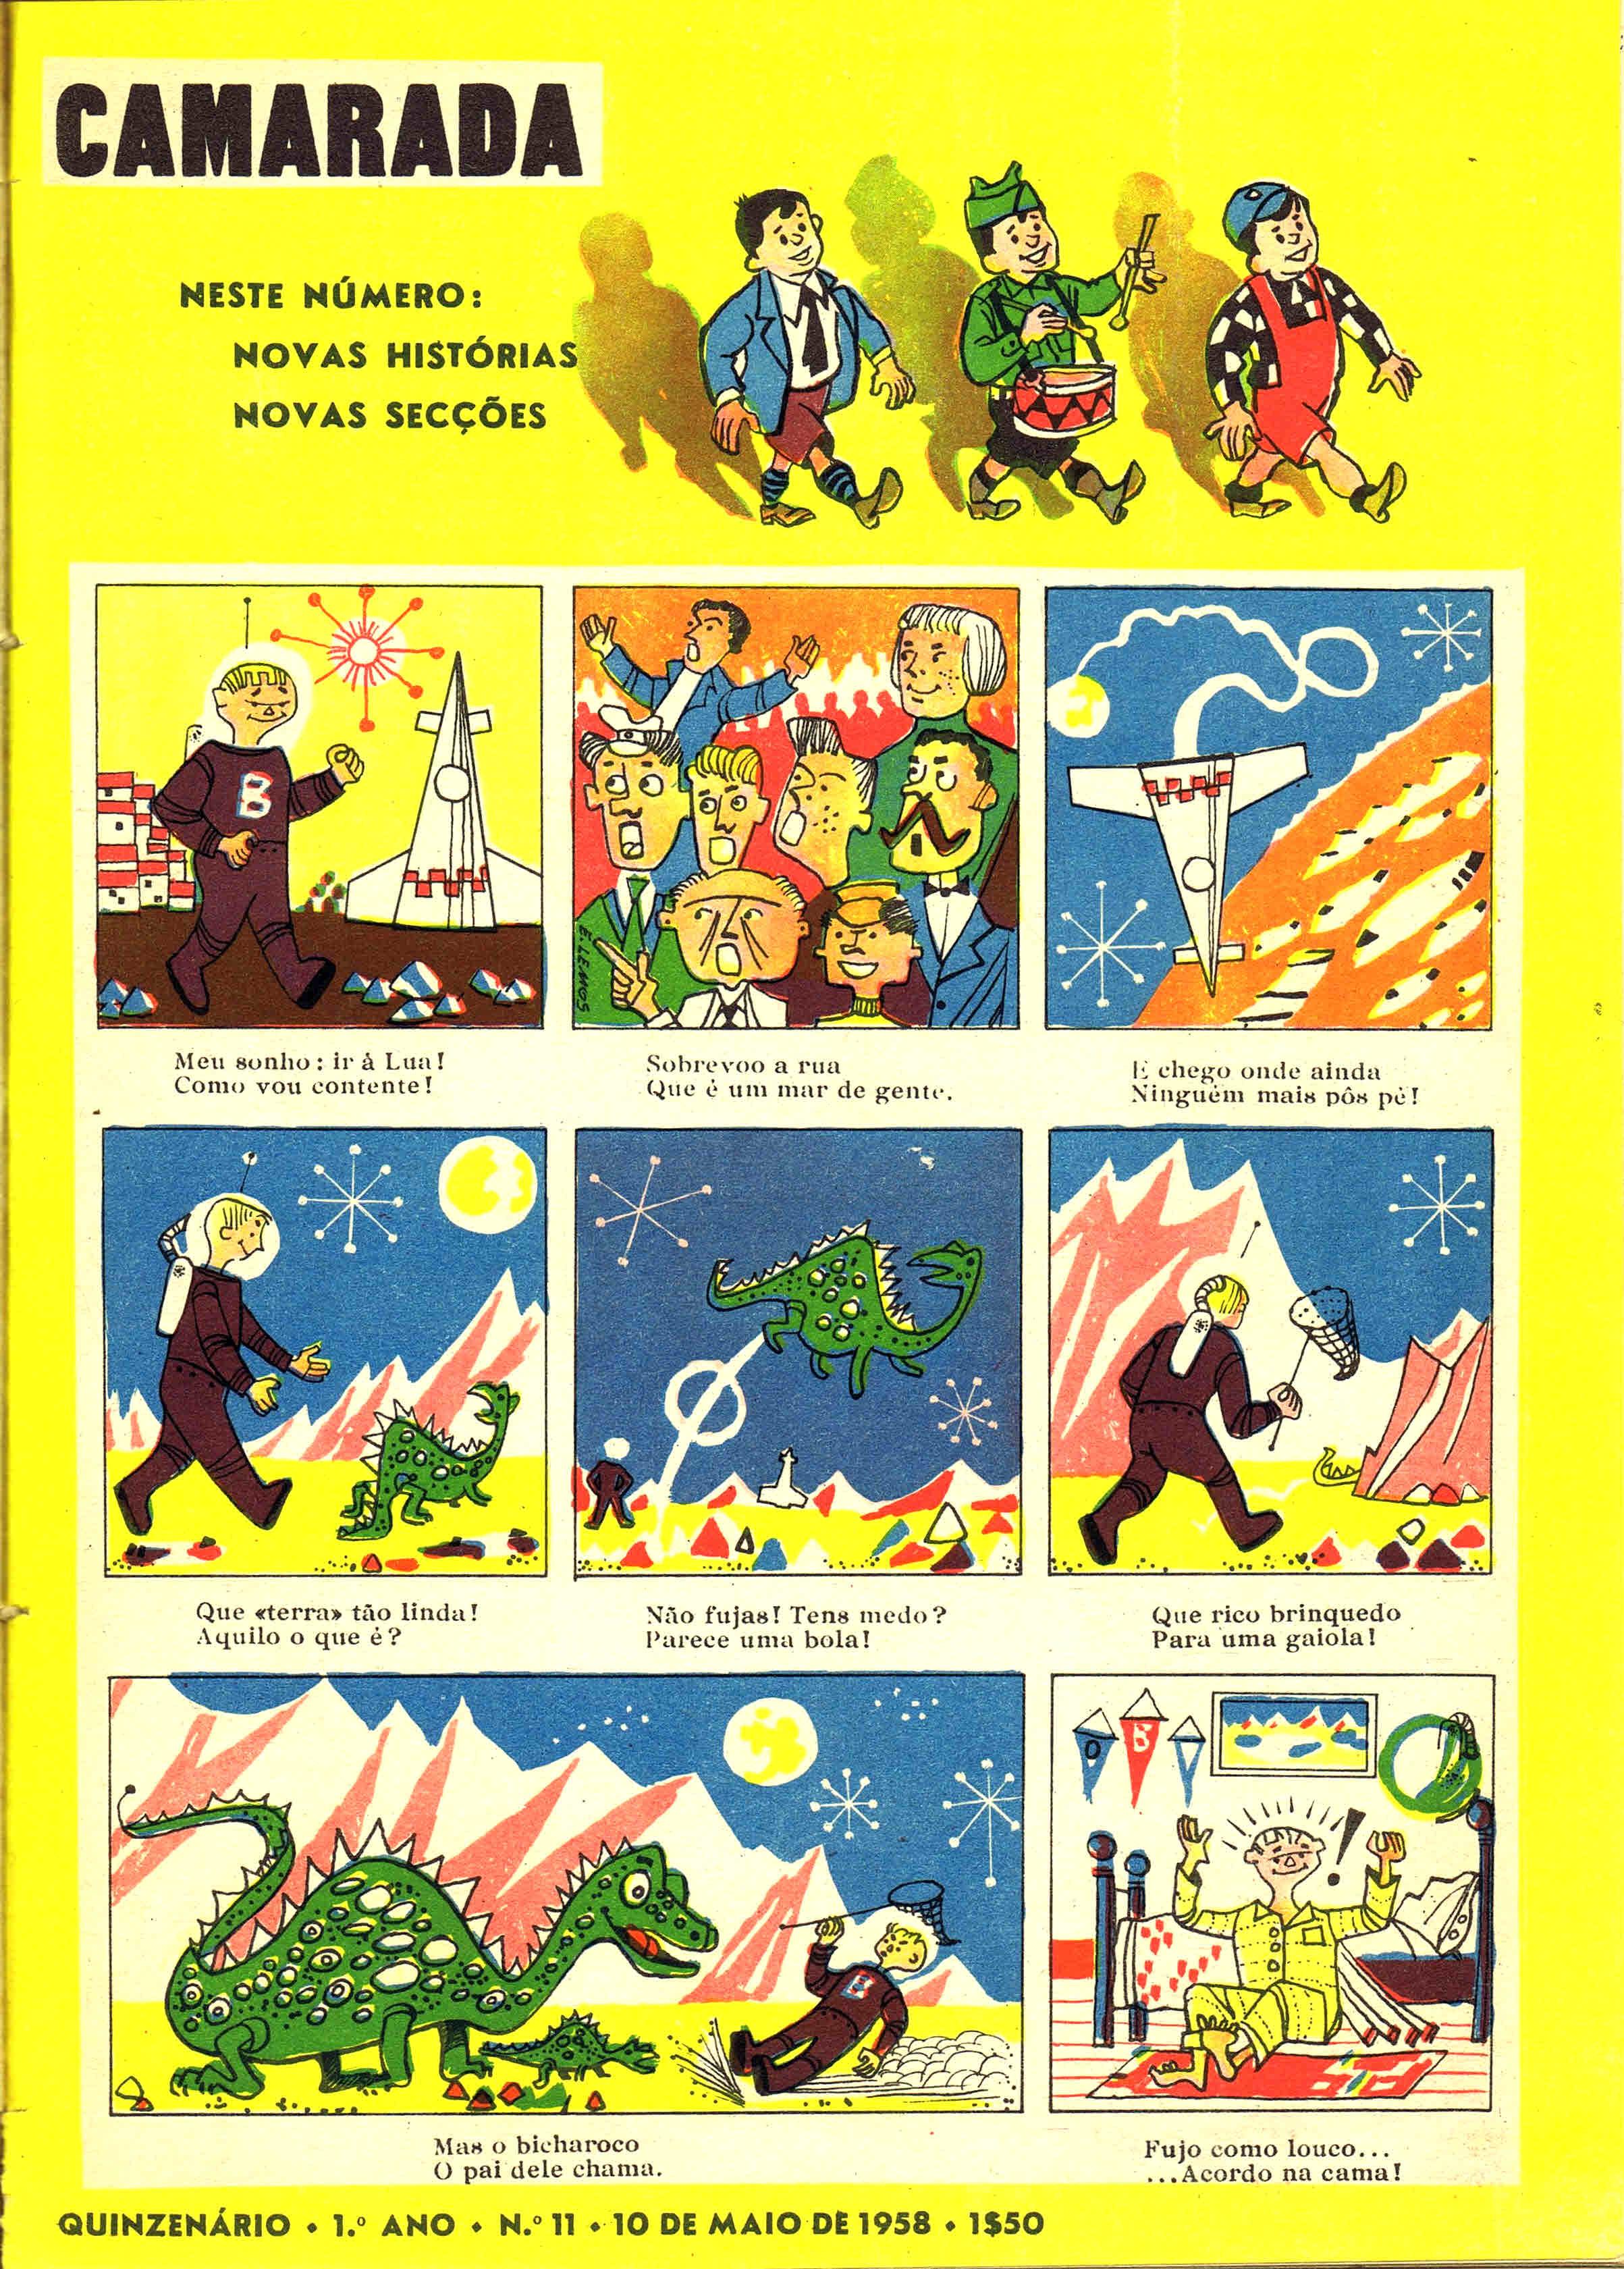 camarada mocidade portuguesa nº 11 1958